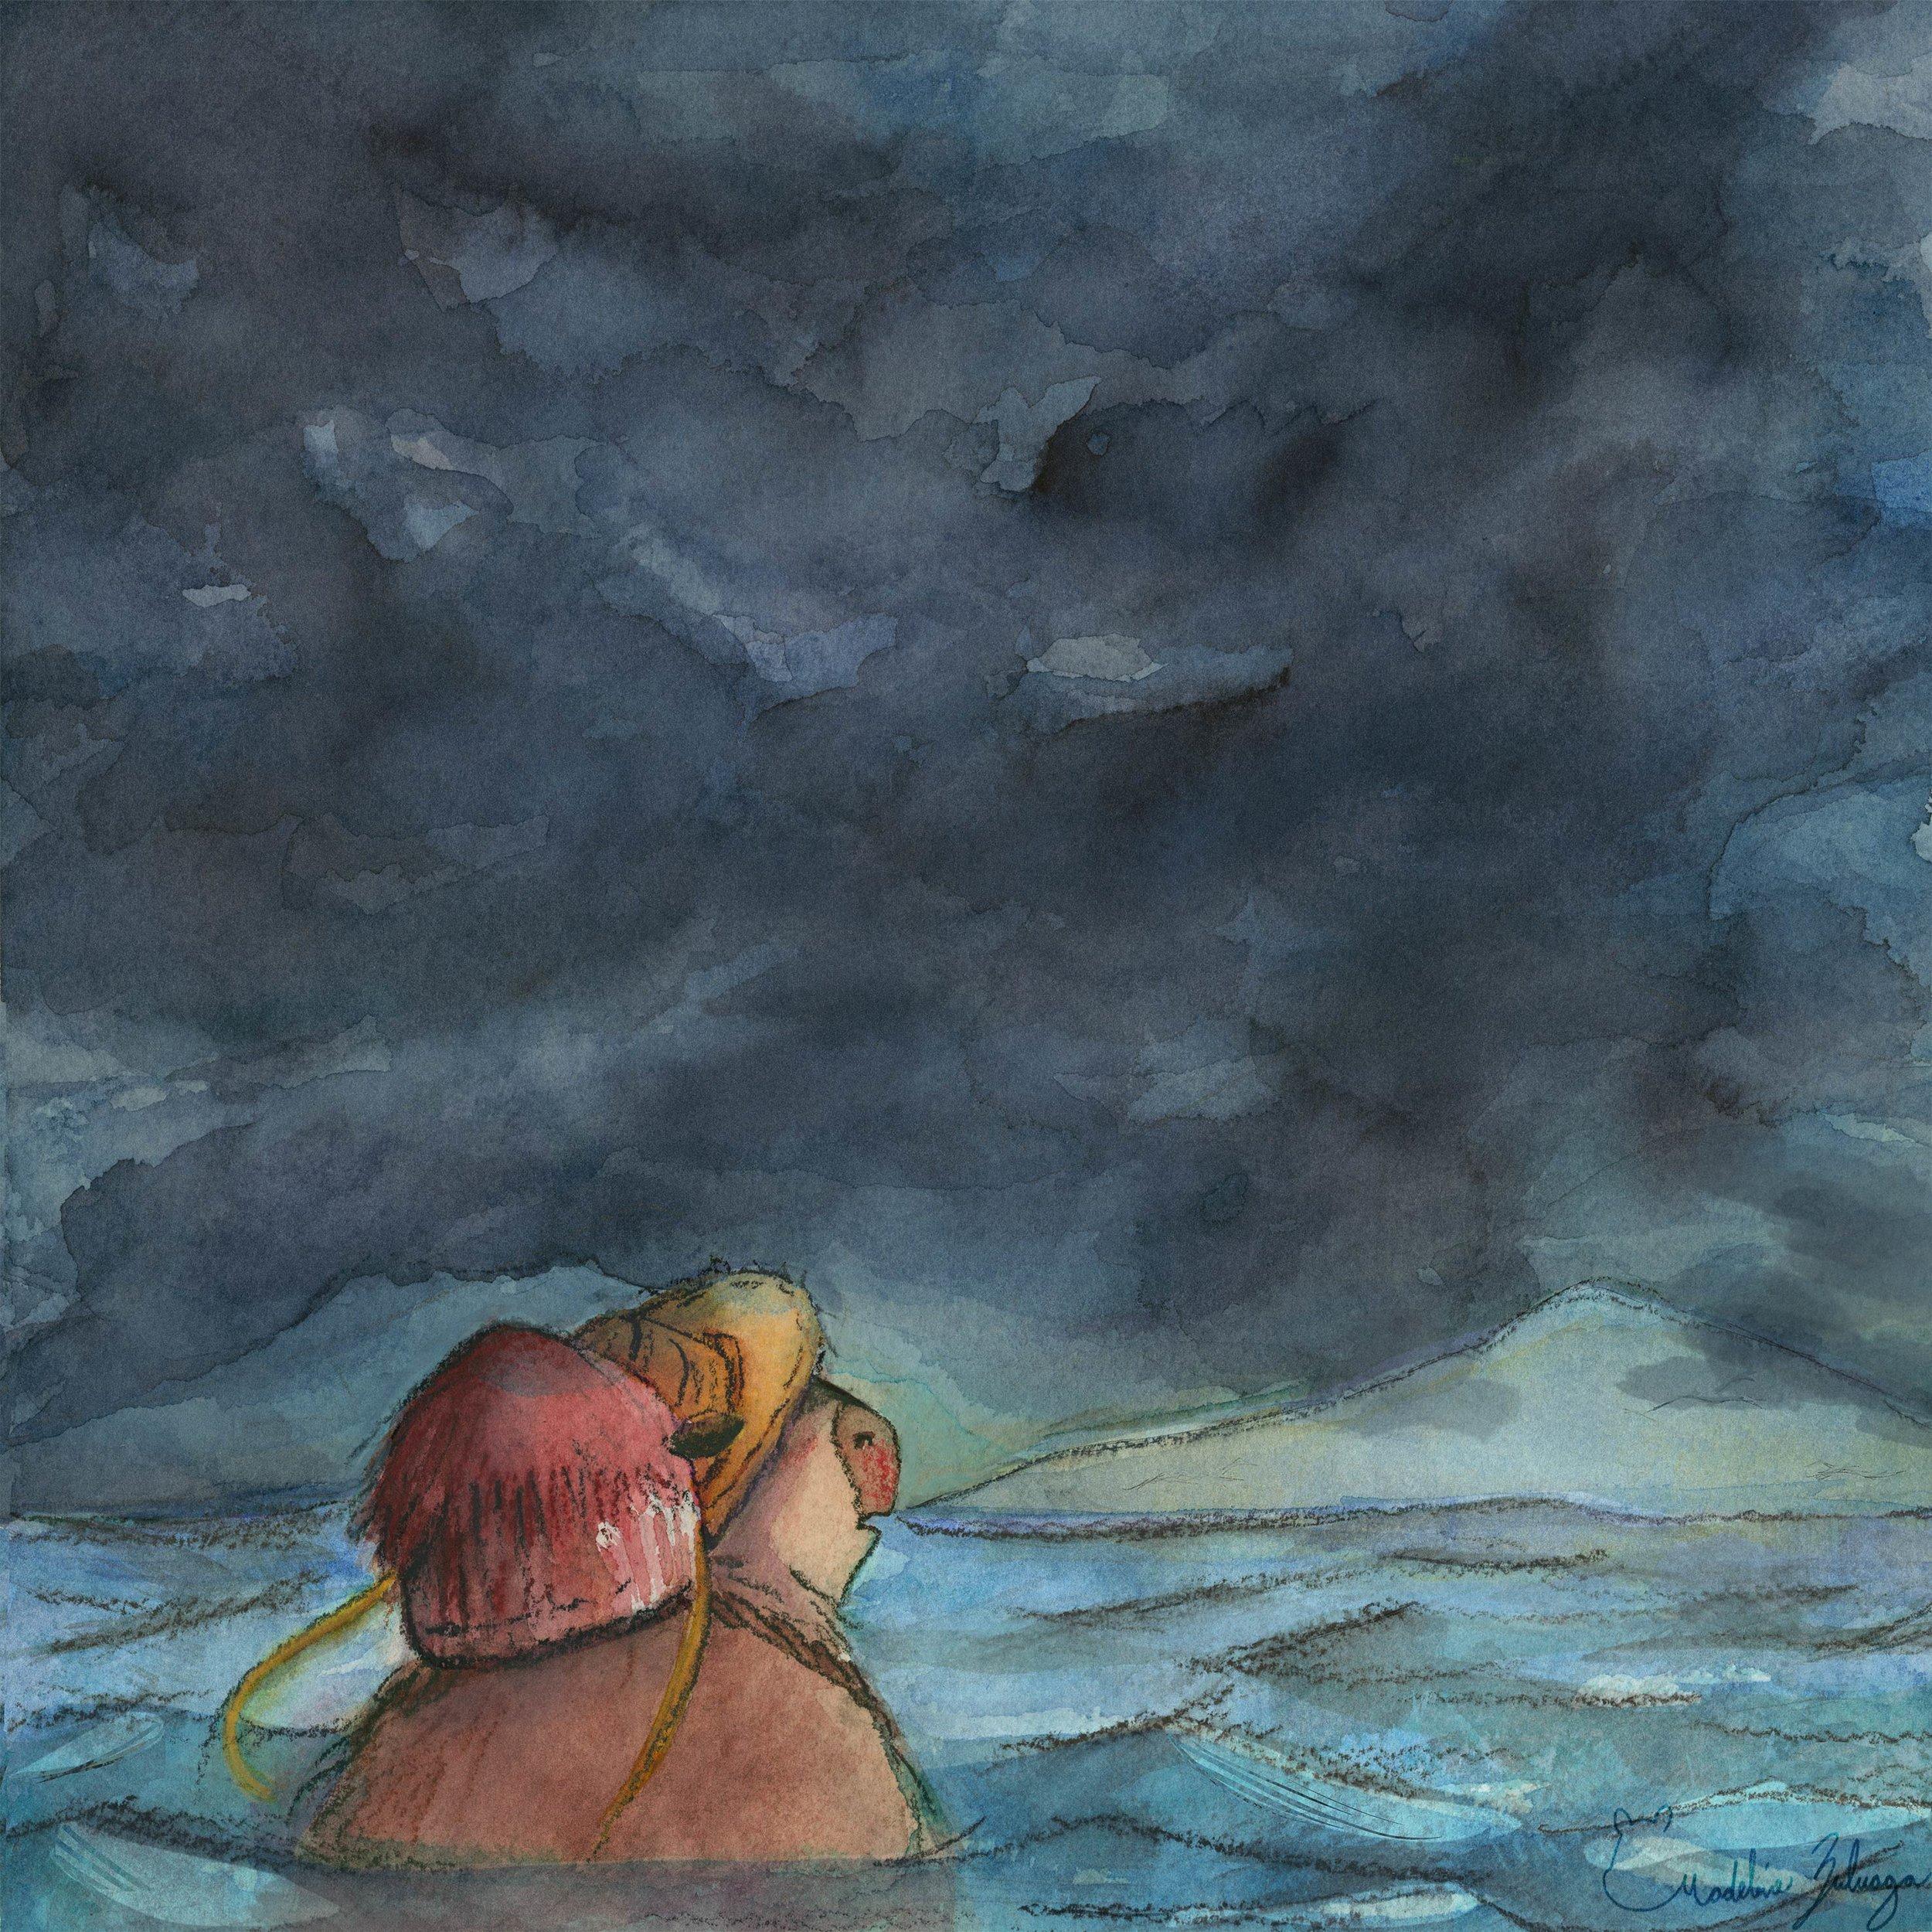 Madeline-Zuluaga-Storm-is-coming.jpg